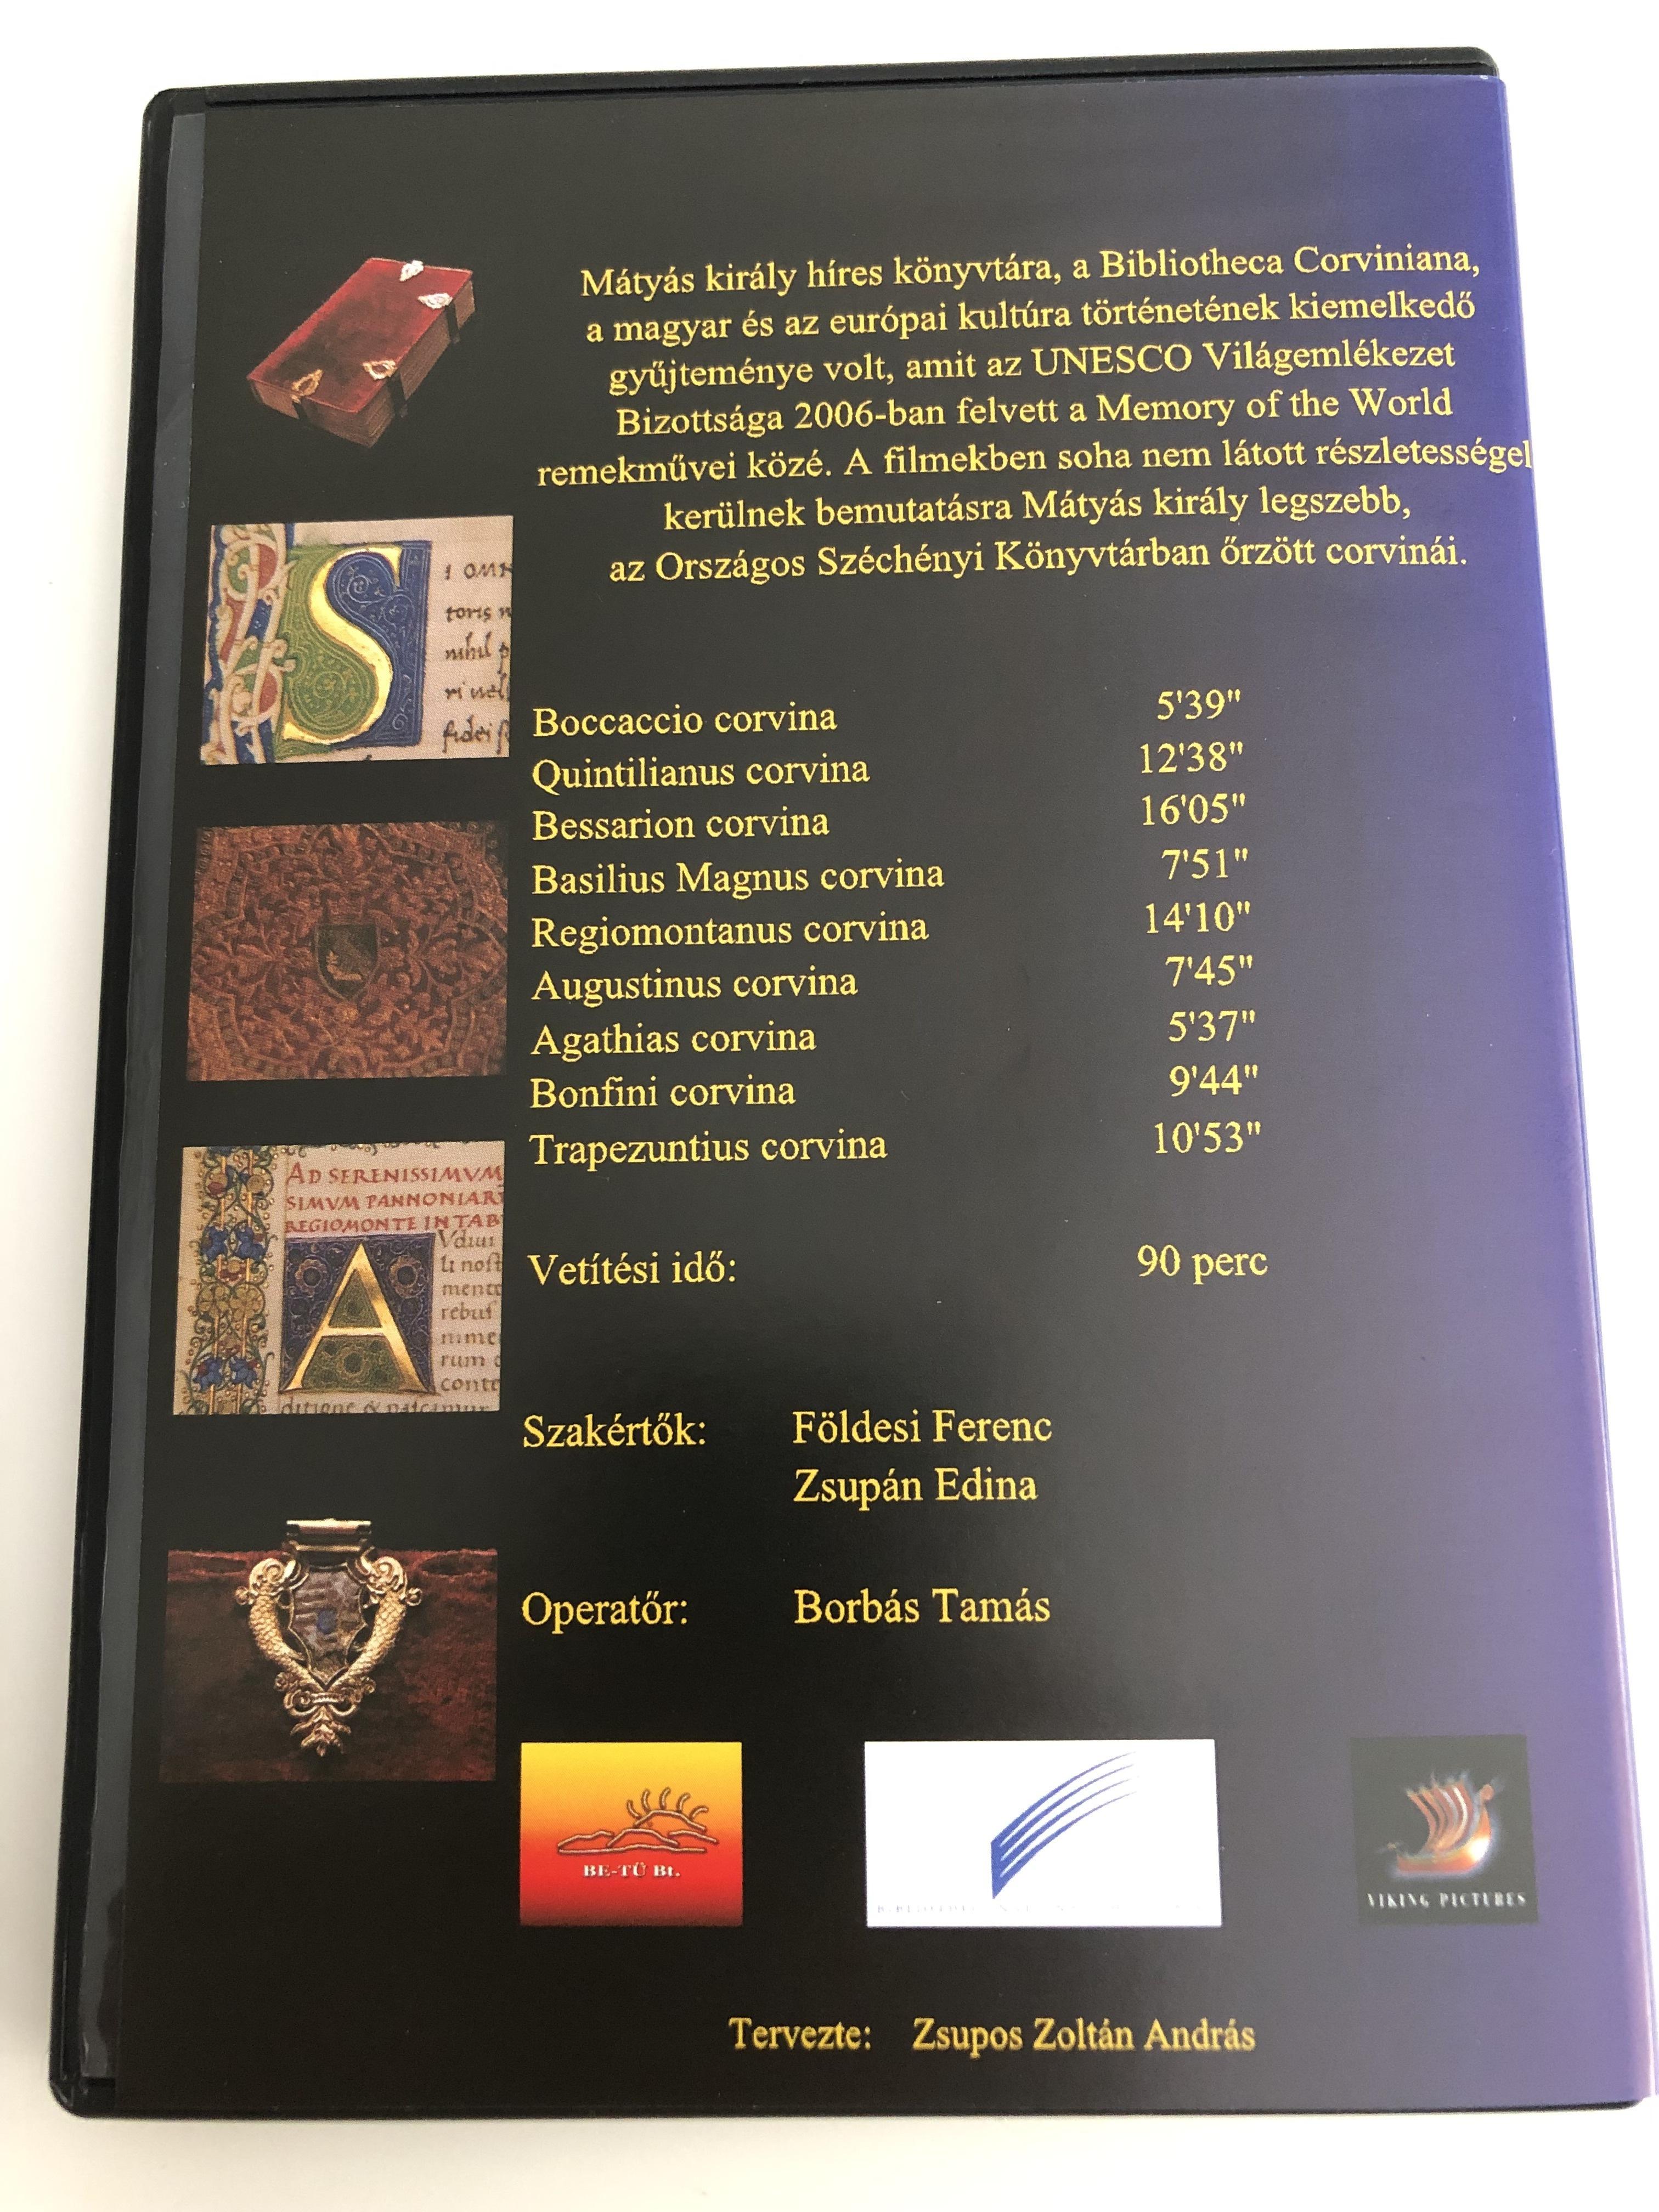 m-ty-s-kir-ly-corvin-i-i.-dvd-a-nemzet-k-nyvt-r-nak-kincsei-directed-by-zsupos-zolt-n-hungarian-king-matthias-bibliotheca-corviniana-2-.jpg